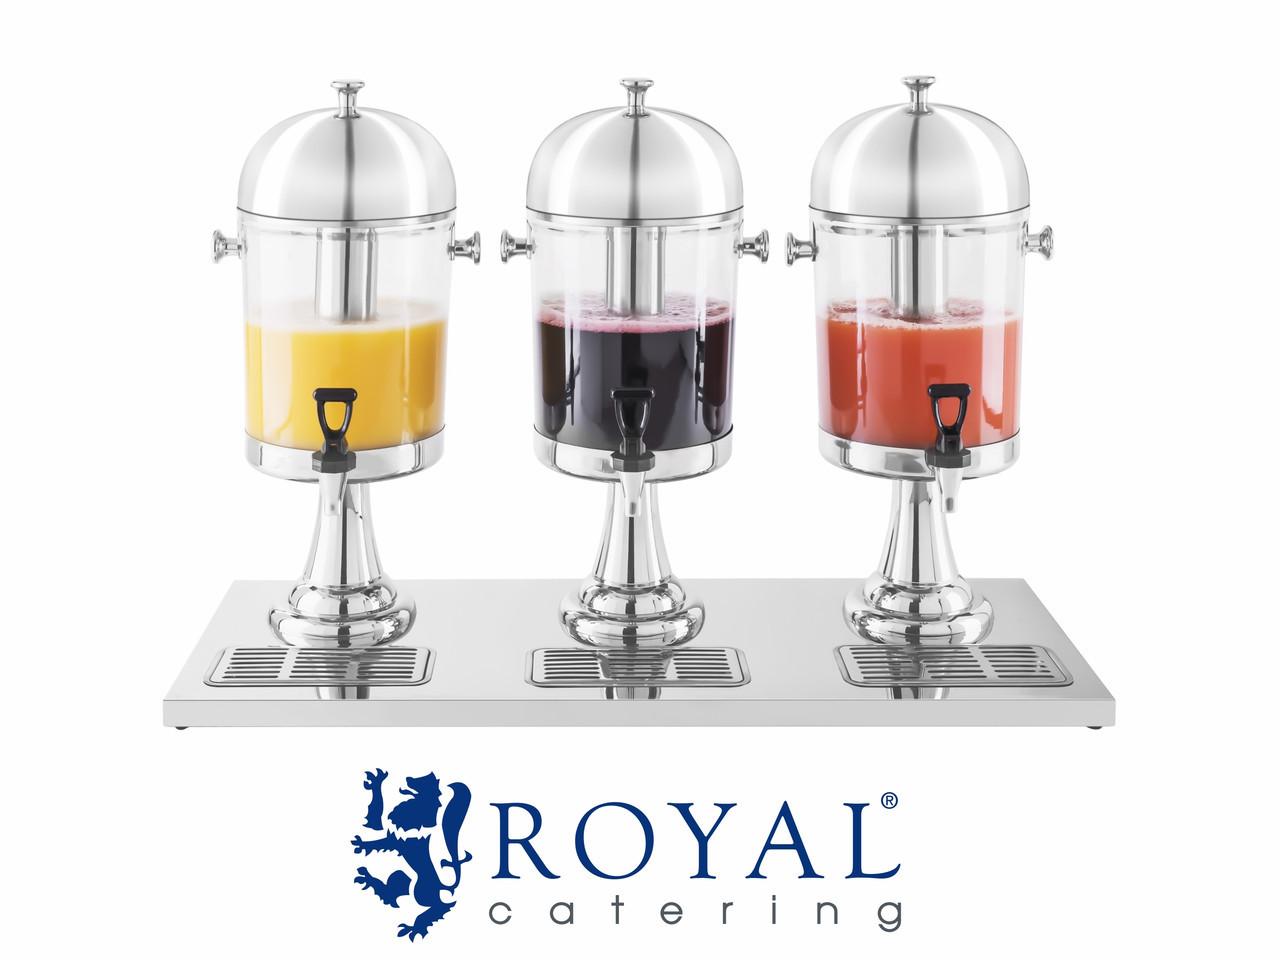 Диспенсер для соков 3 x 7 литра ROYAL